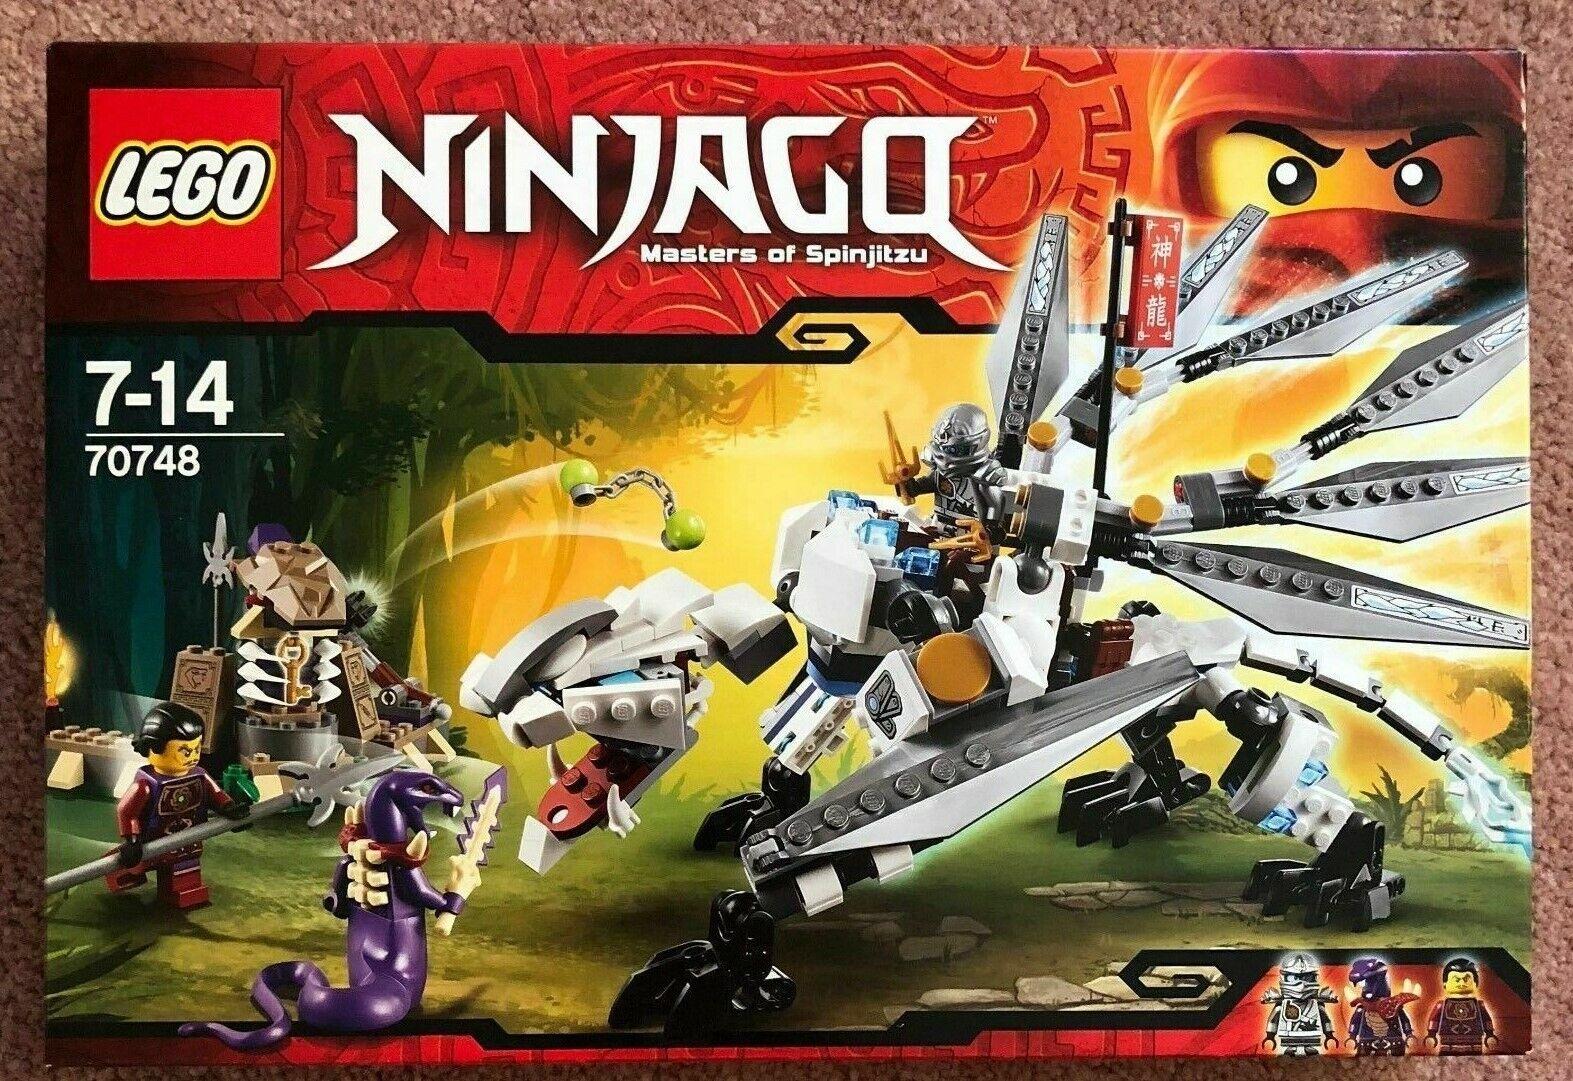 Lego Ninjago 70748 Titanium Dragon 100% Complete with instructions, NO minifigs.